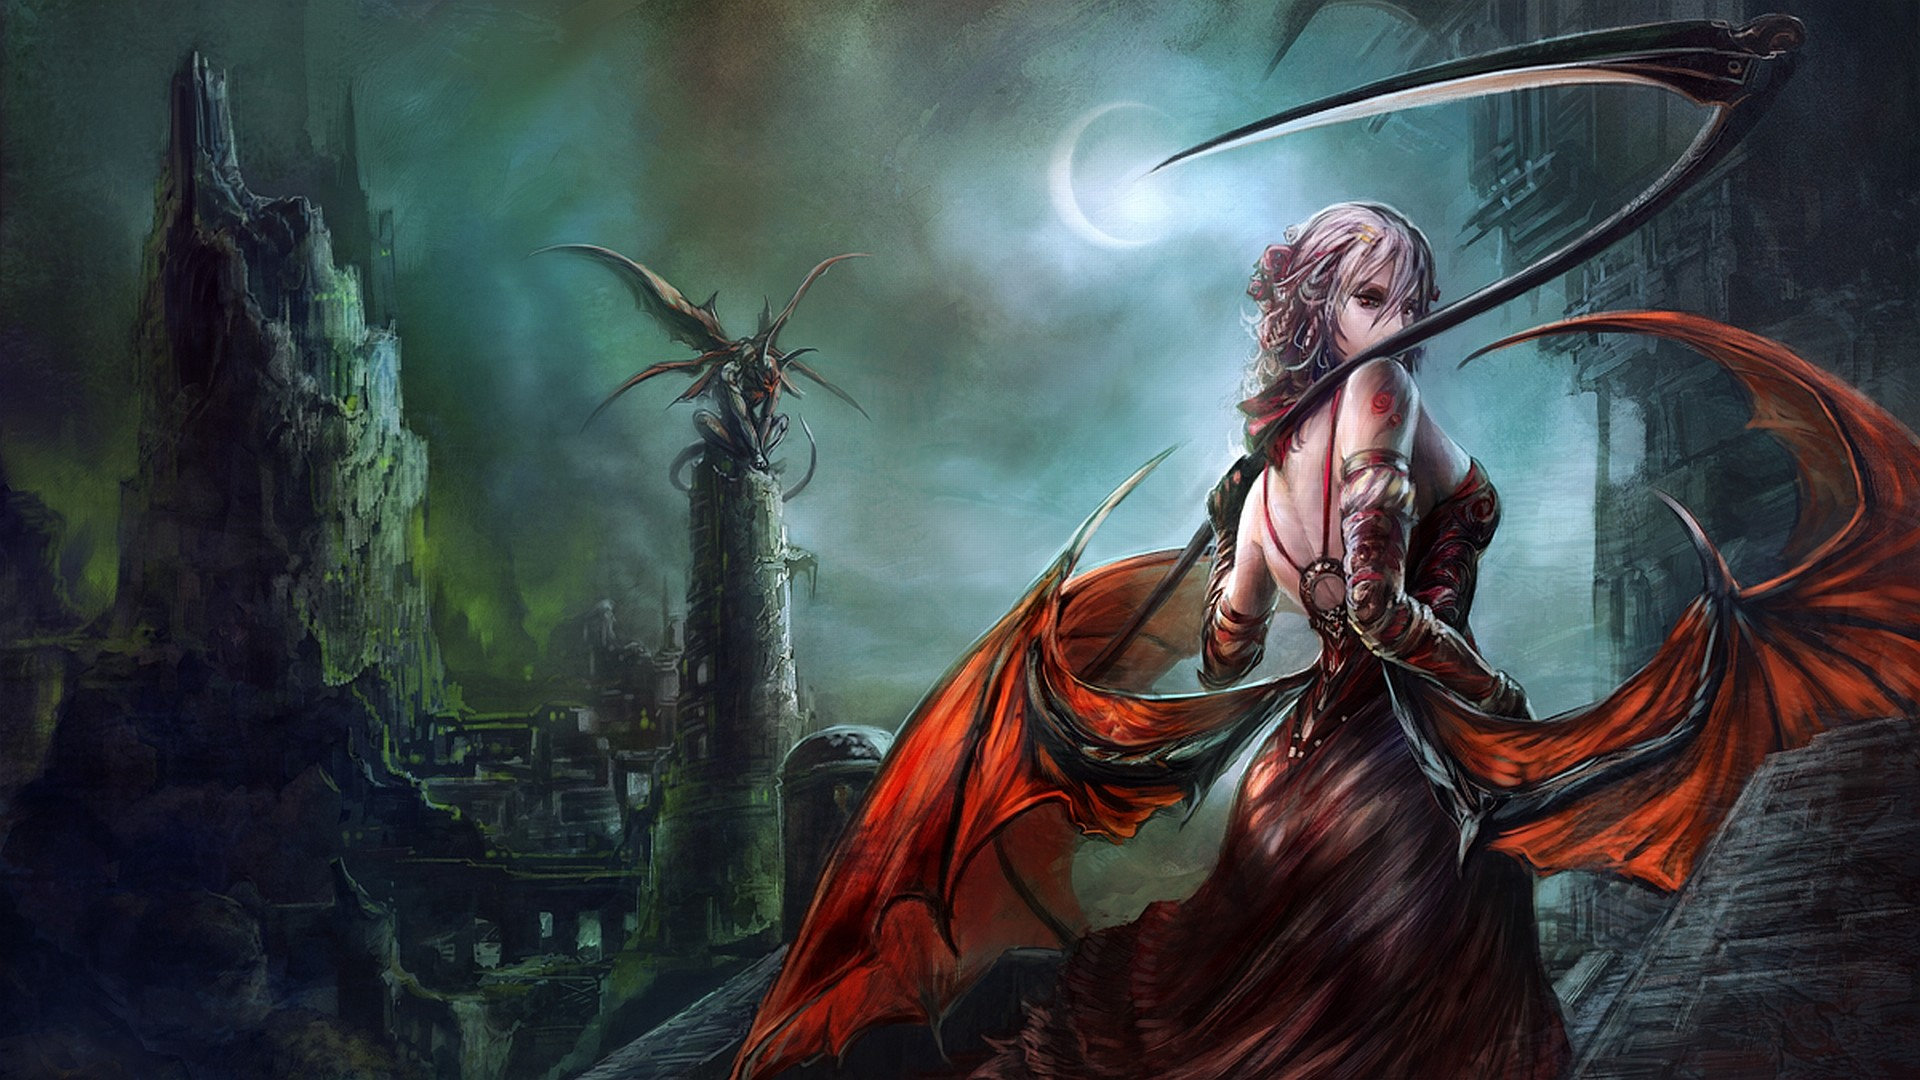 Res: 1920x1080, Fantasy - Women Warrior Wallpaper